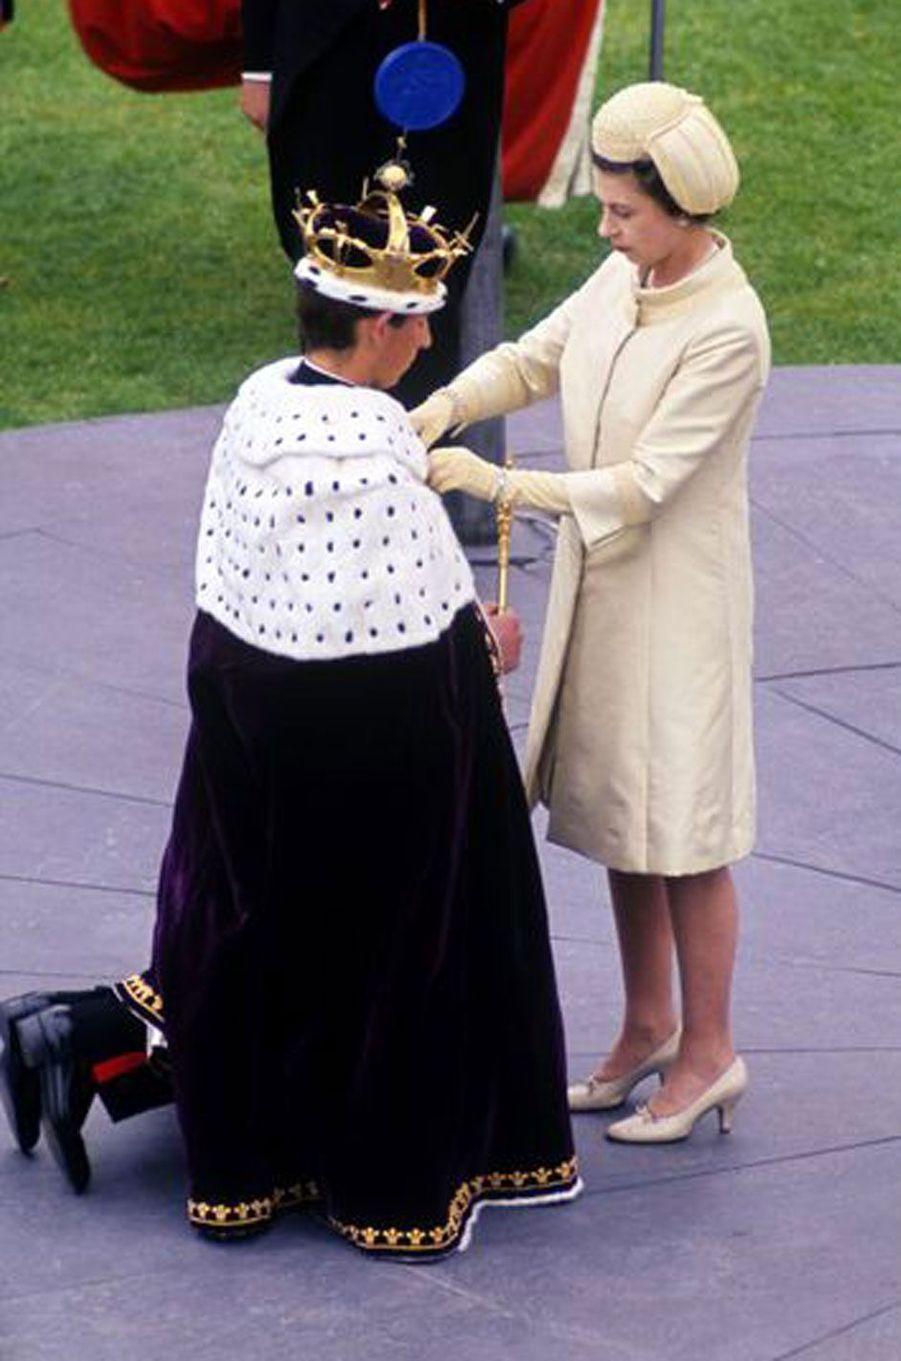 Elizabeth couronne Charles, prince de Galles, le 1er juillet 1969